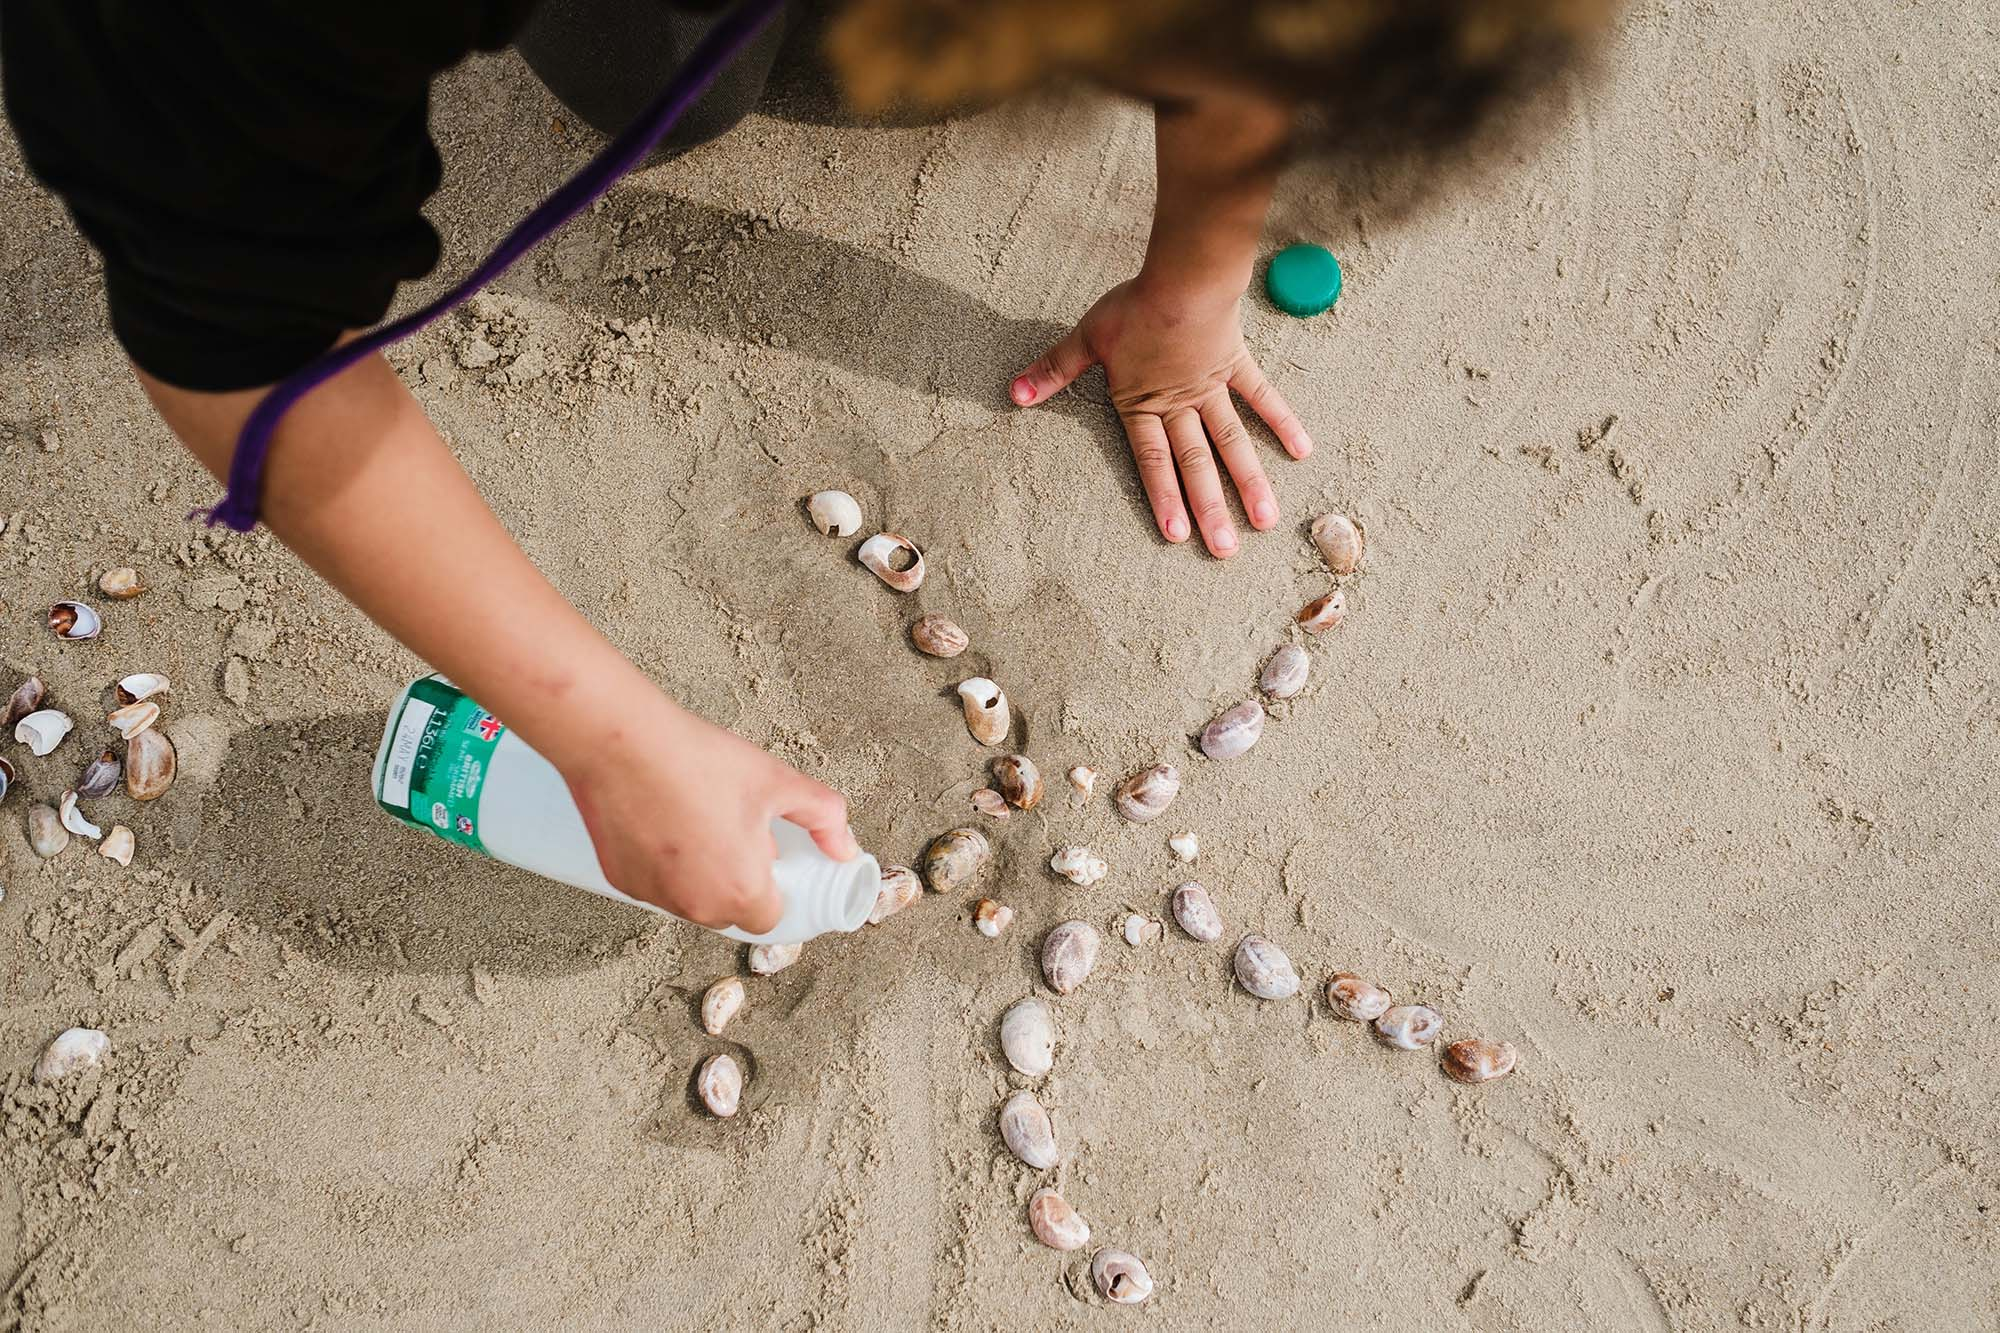 making art at the beach